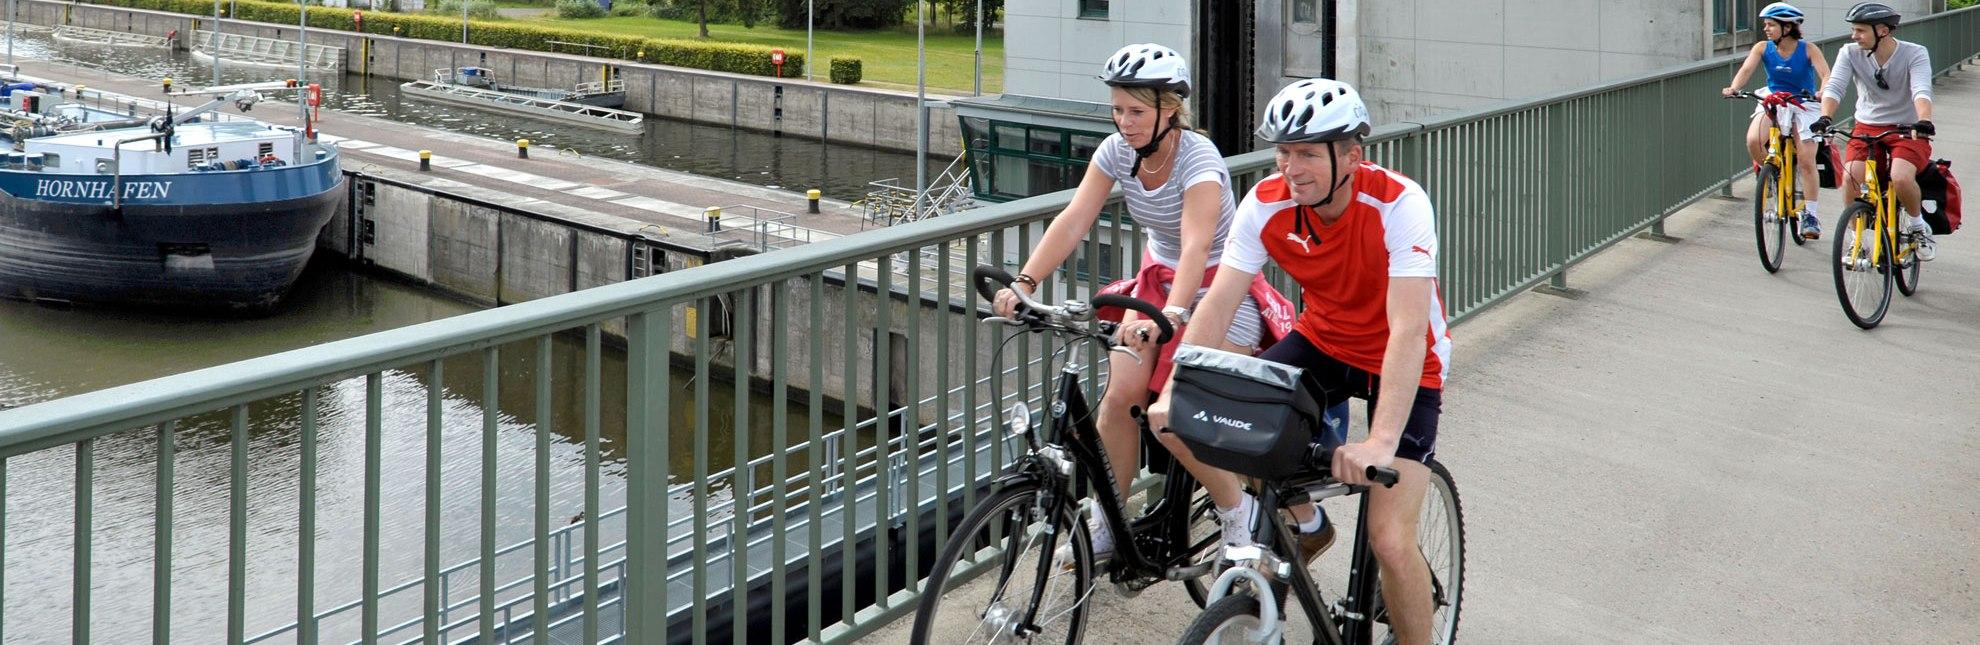 Radfahrer an der Schleuse in Geesthacht, © photocompany